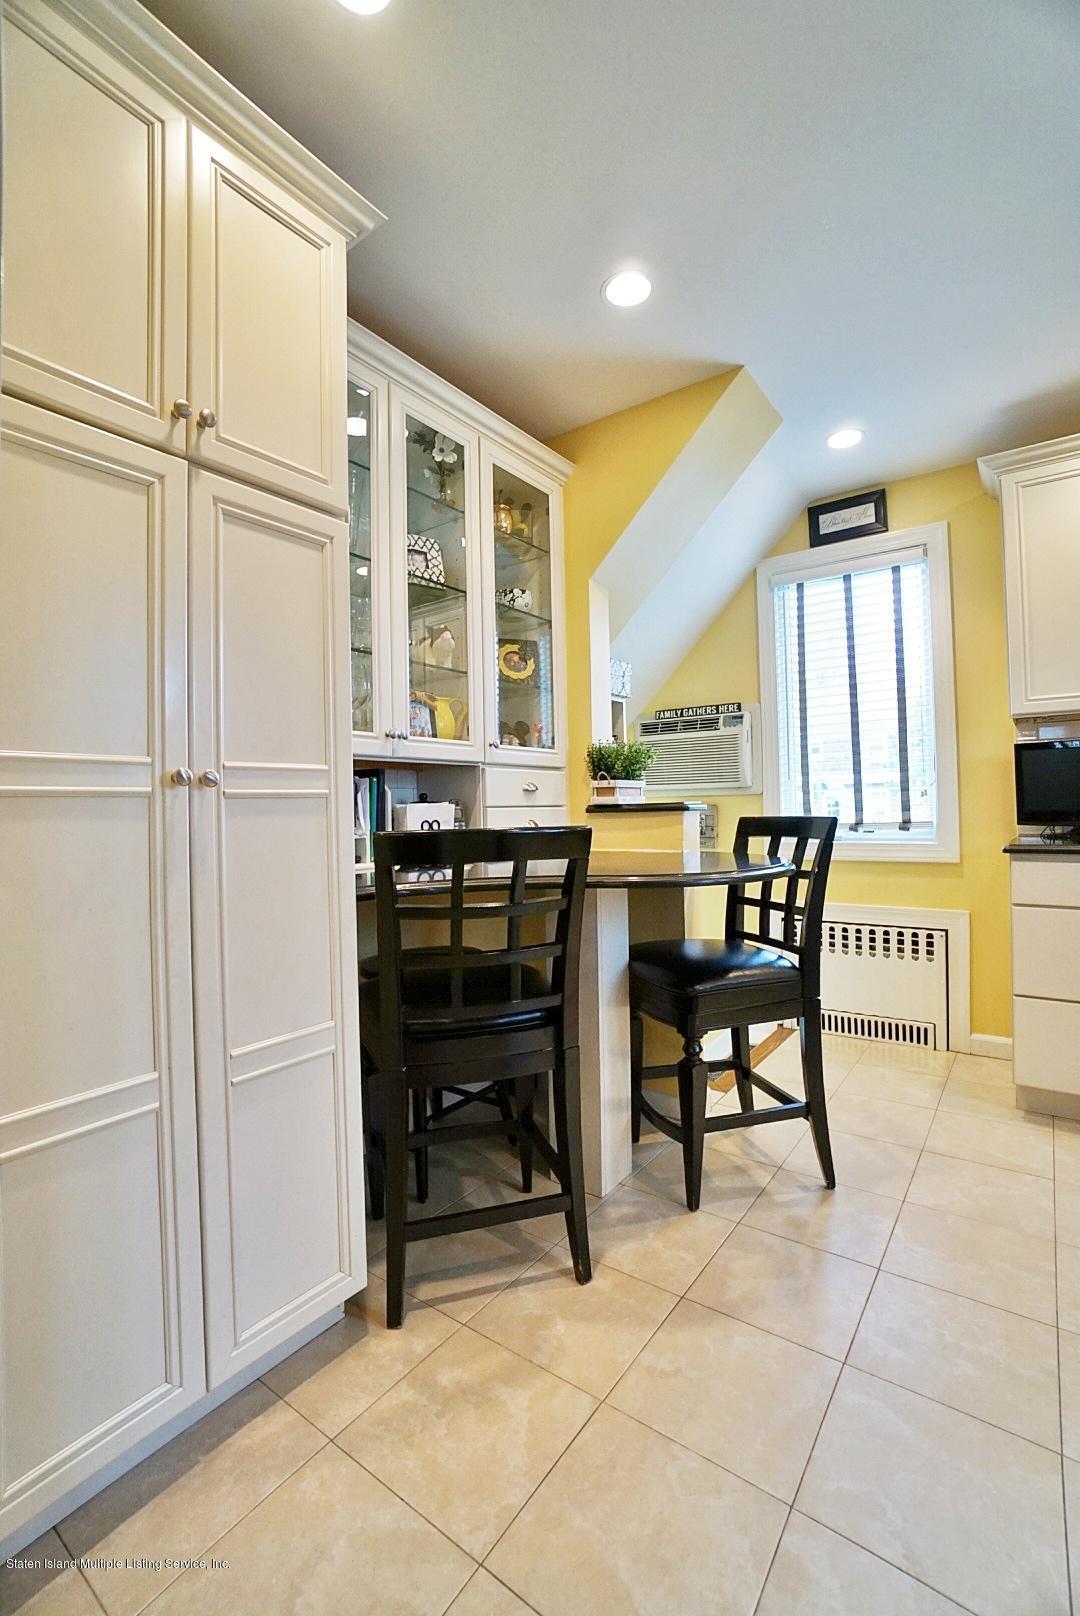 Single Family - Detached 171 Keiber Court  Staten Island, NY 10314, MLS-1127425-13